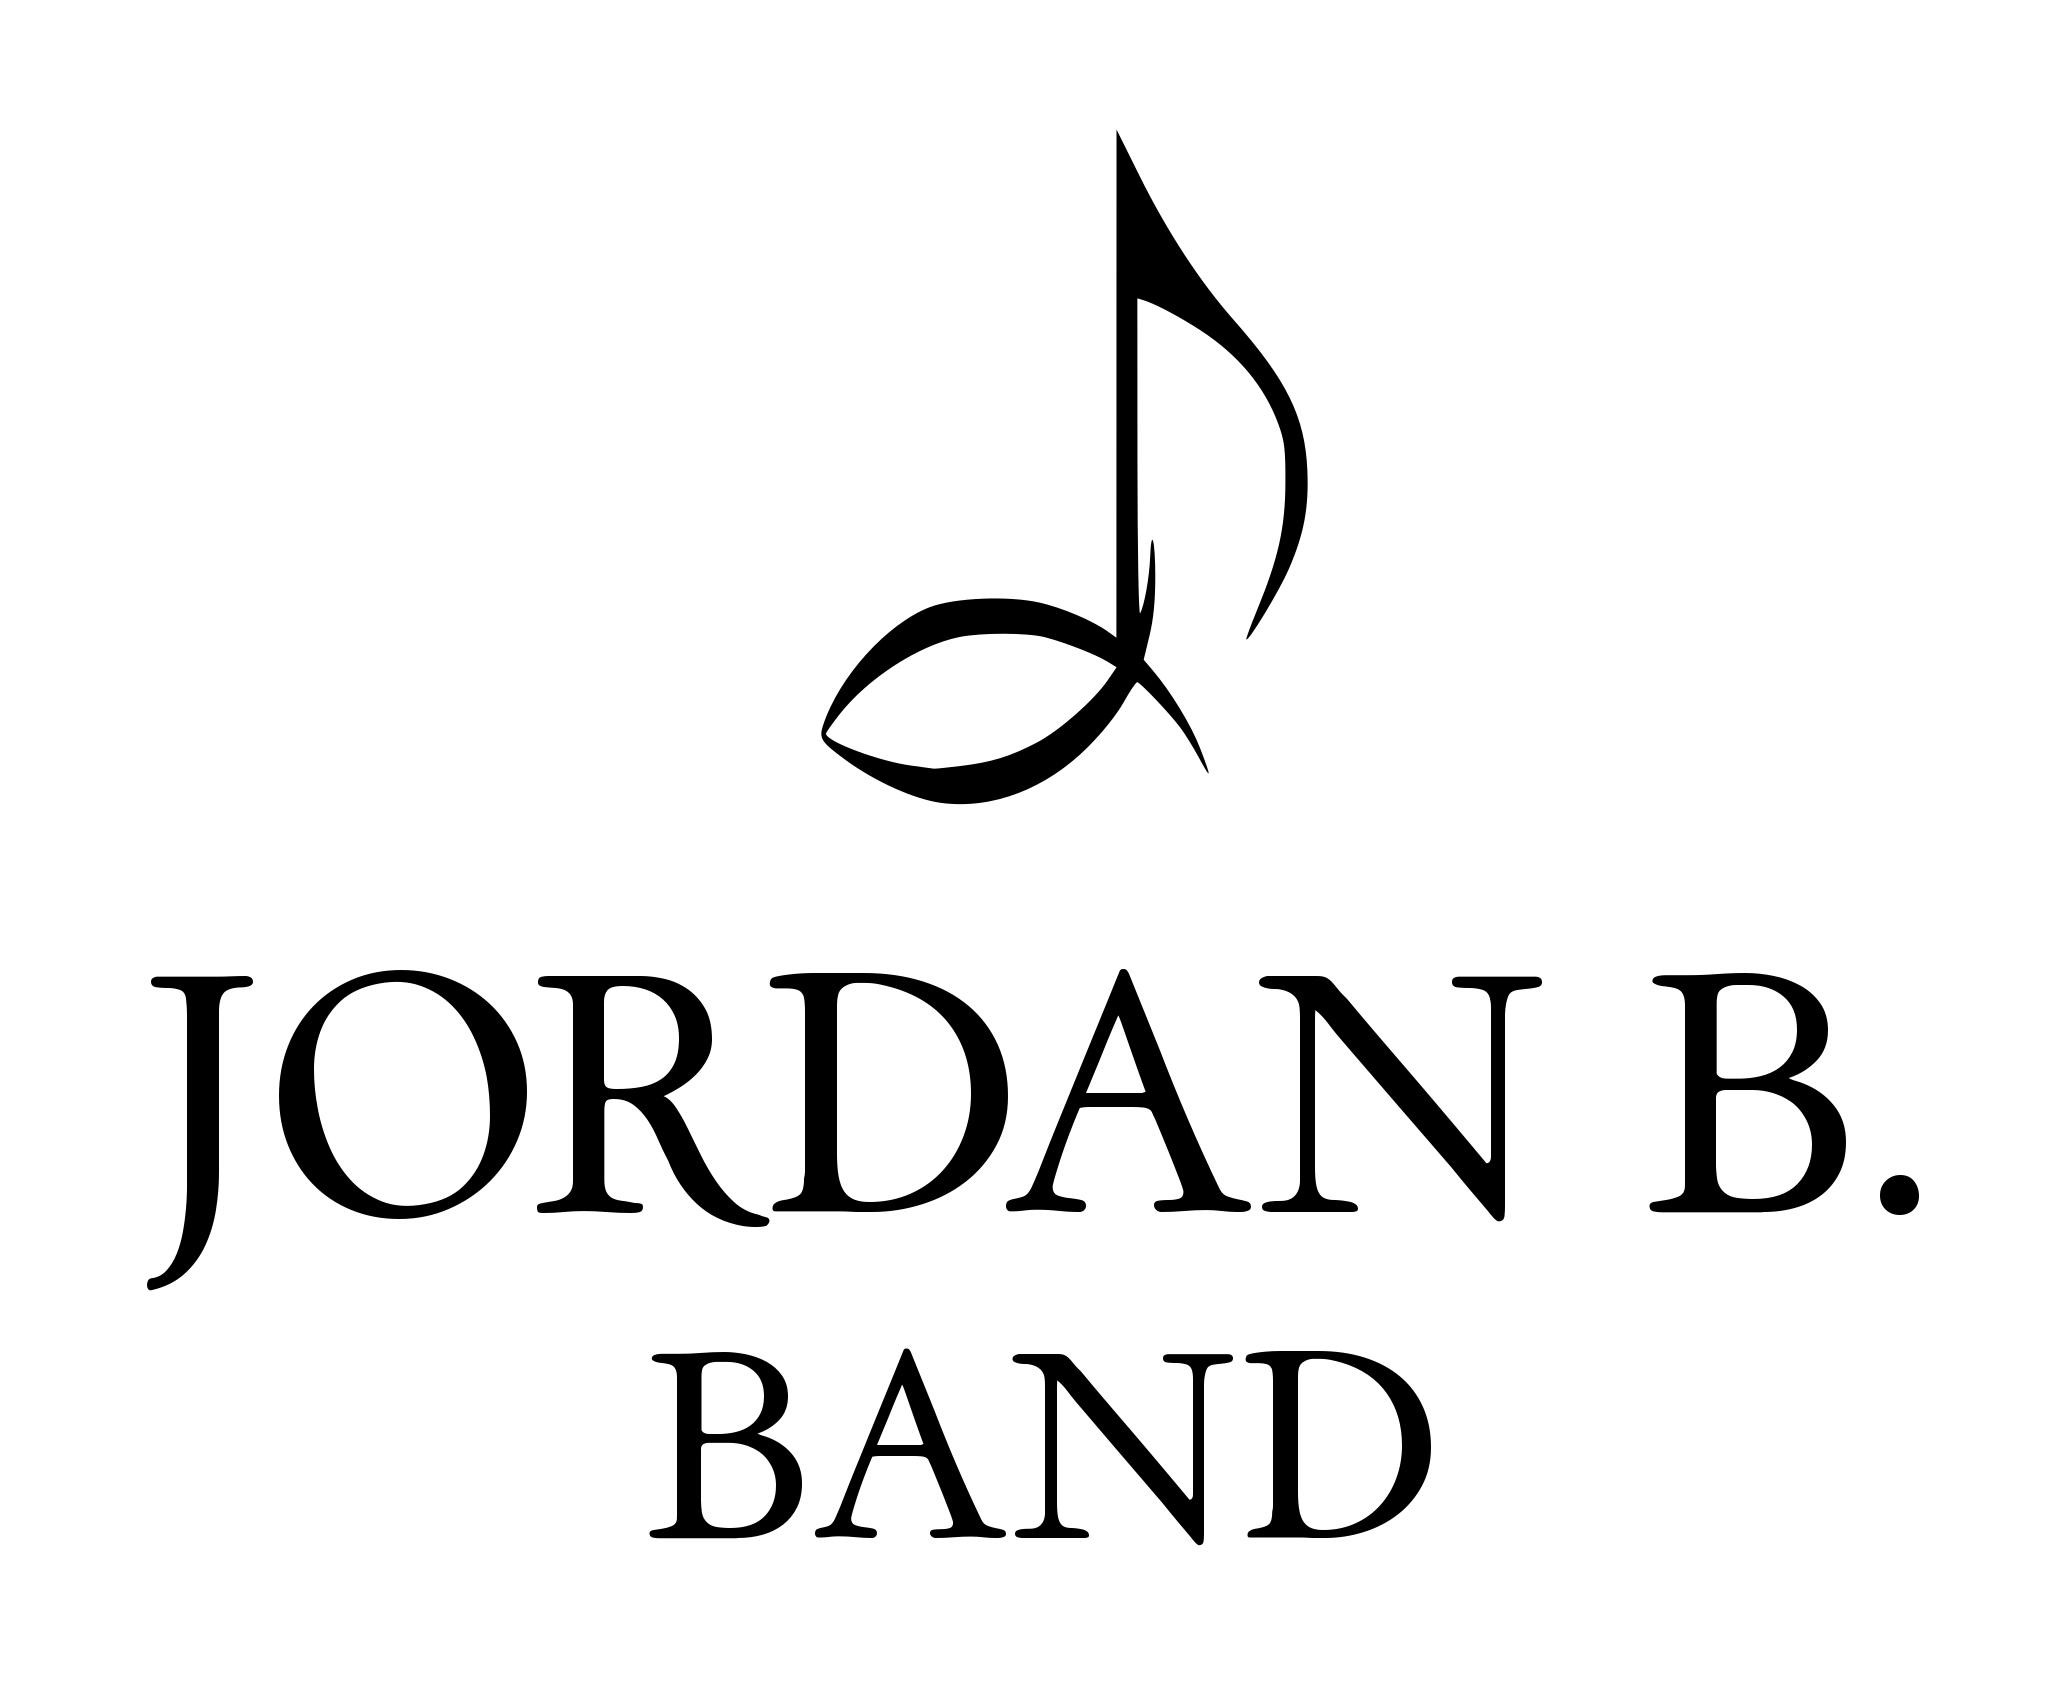 Jordan B. Band logo